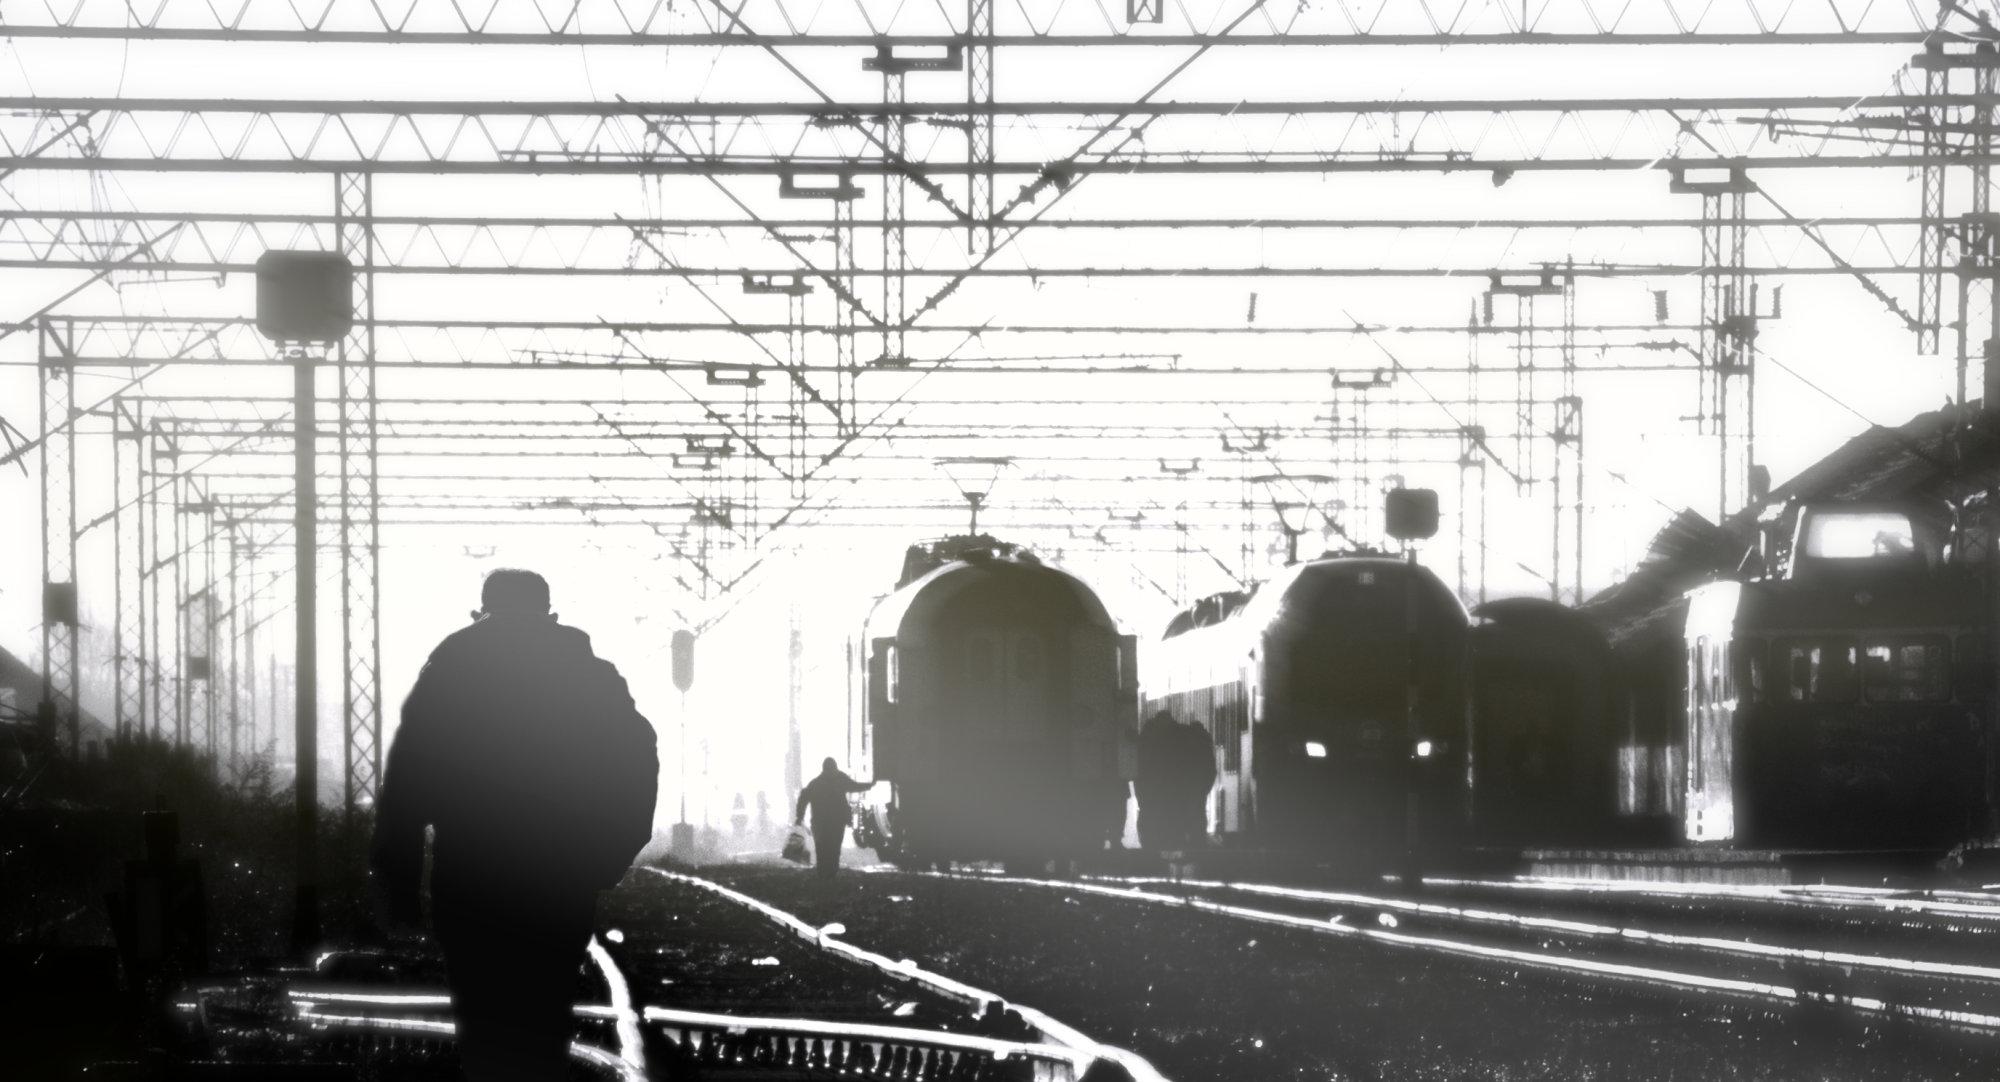 About the railway - XXXVII